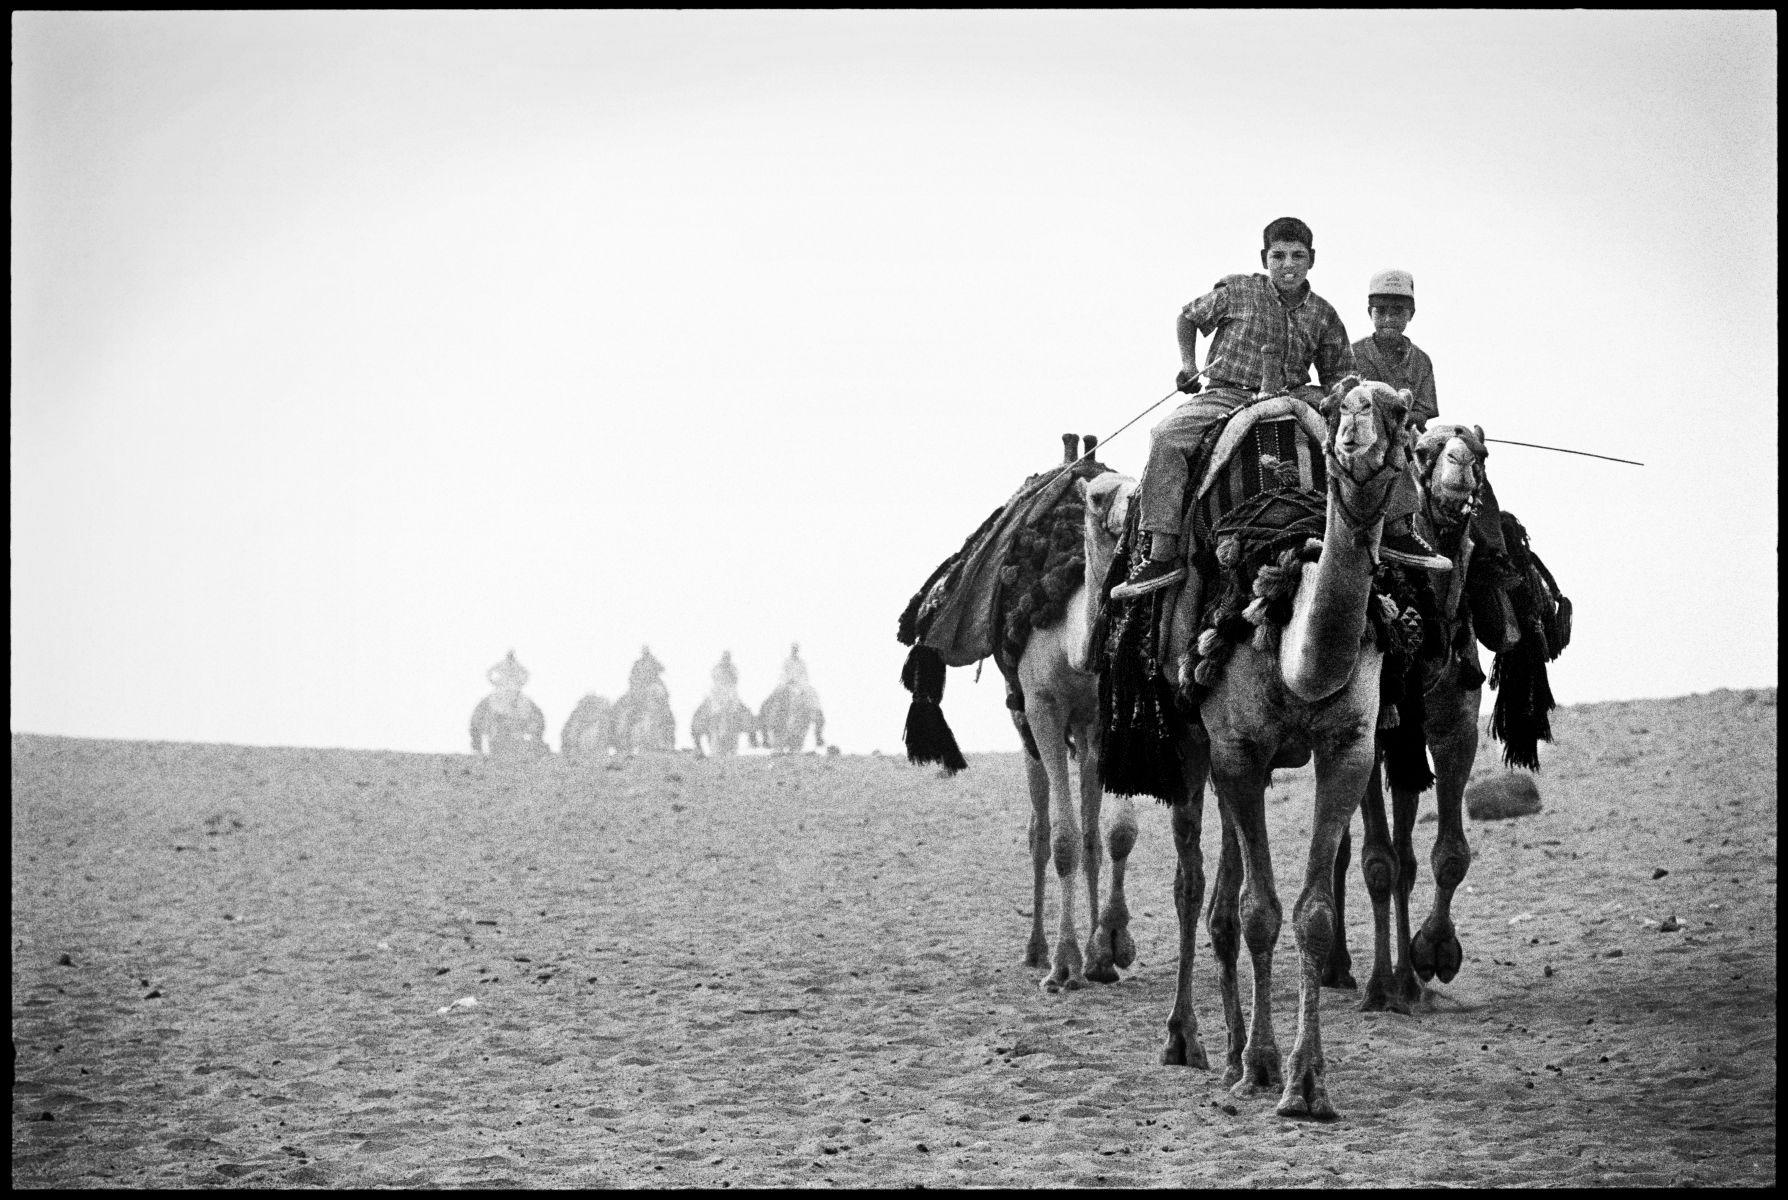 Giza Plateau, Egypt 2000